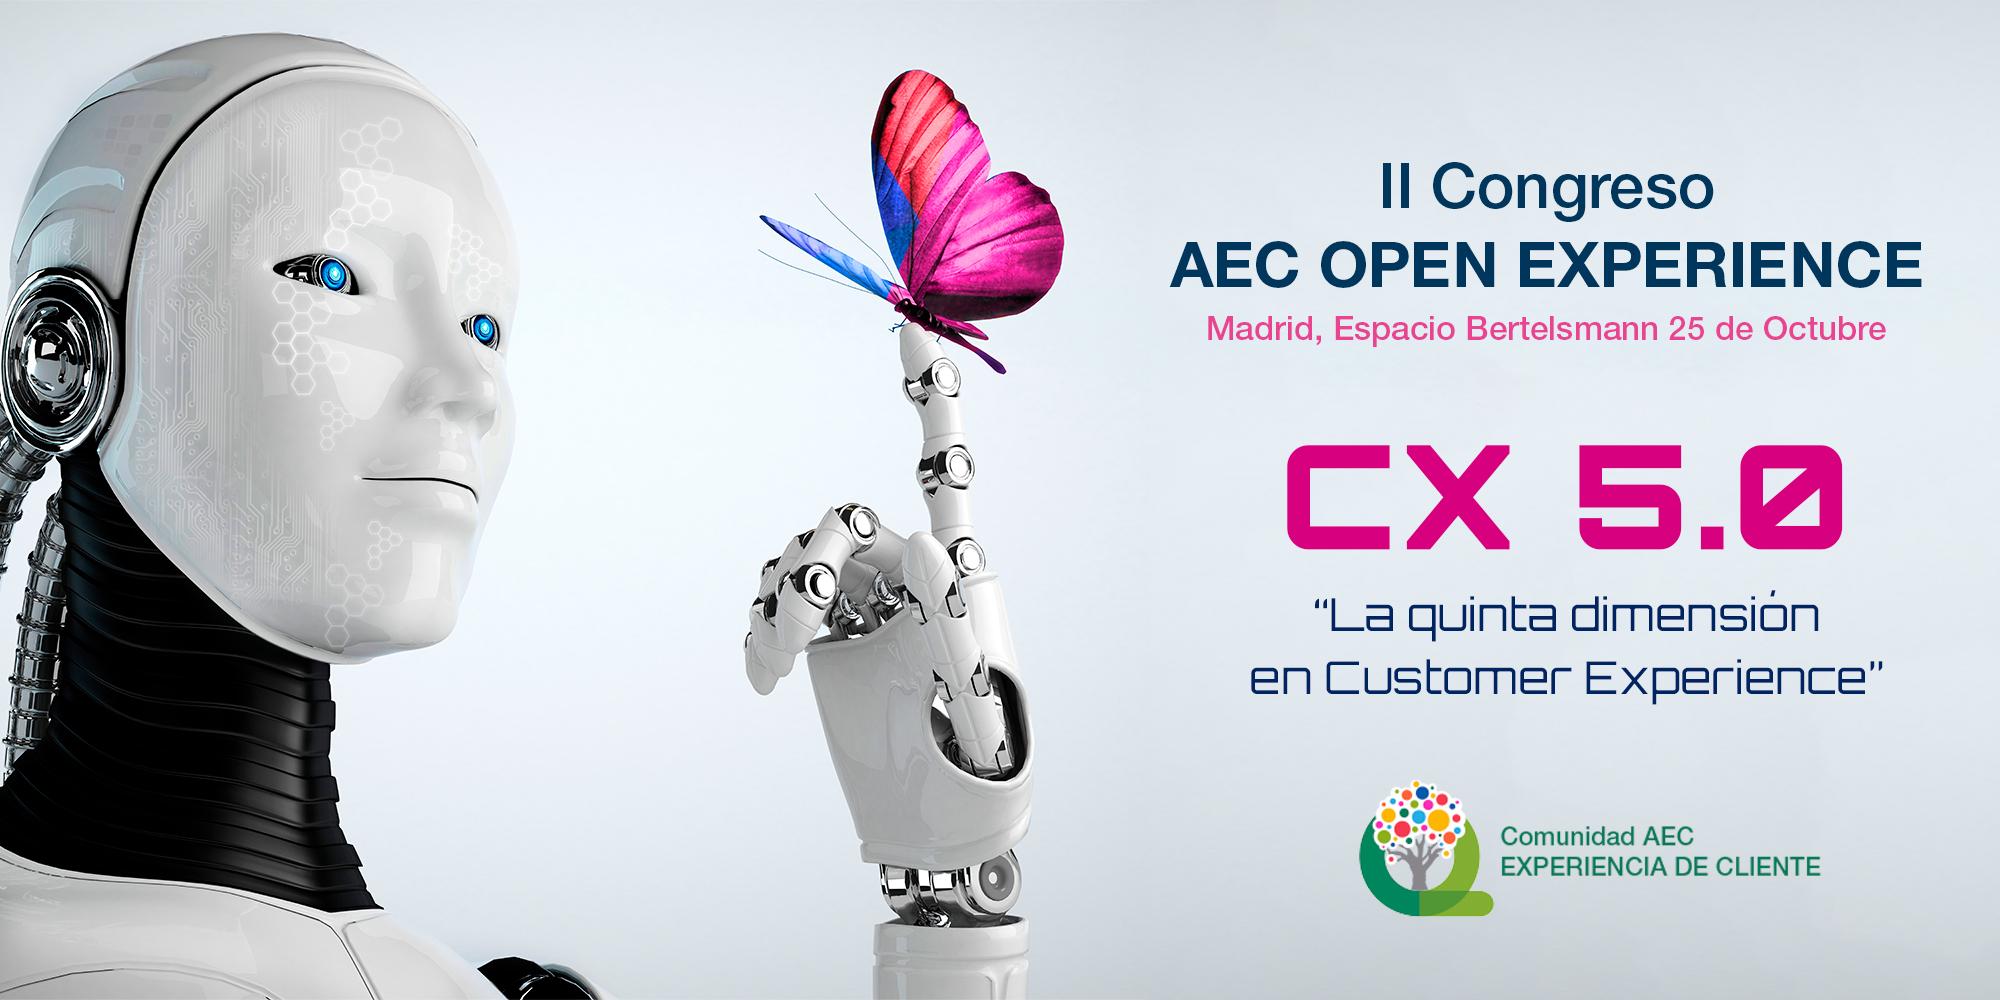 II Congreso AEC Open Experience